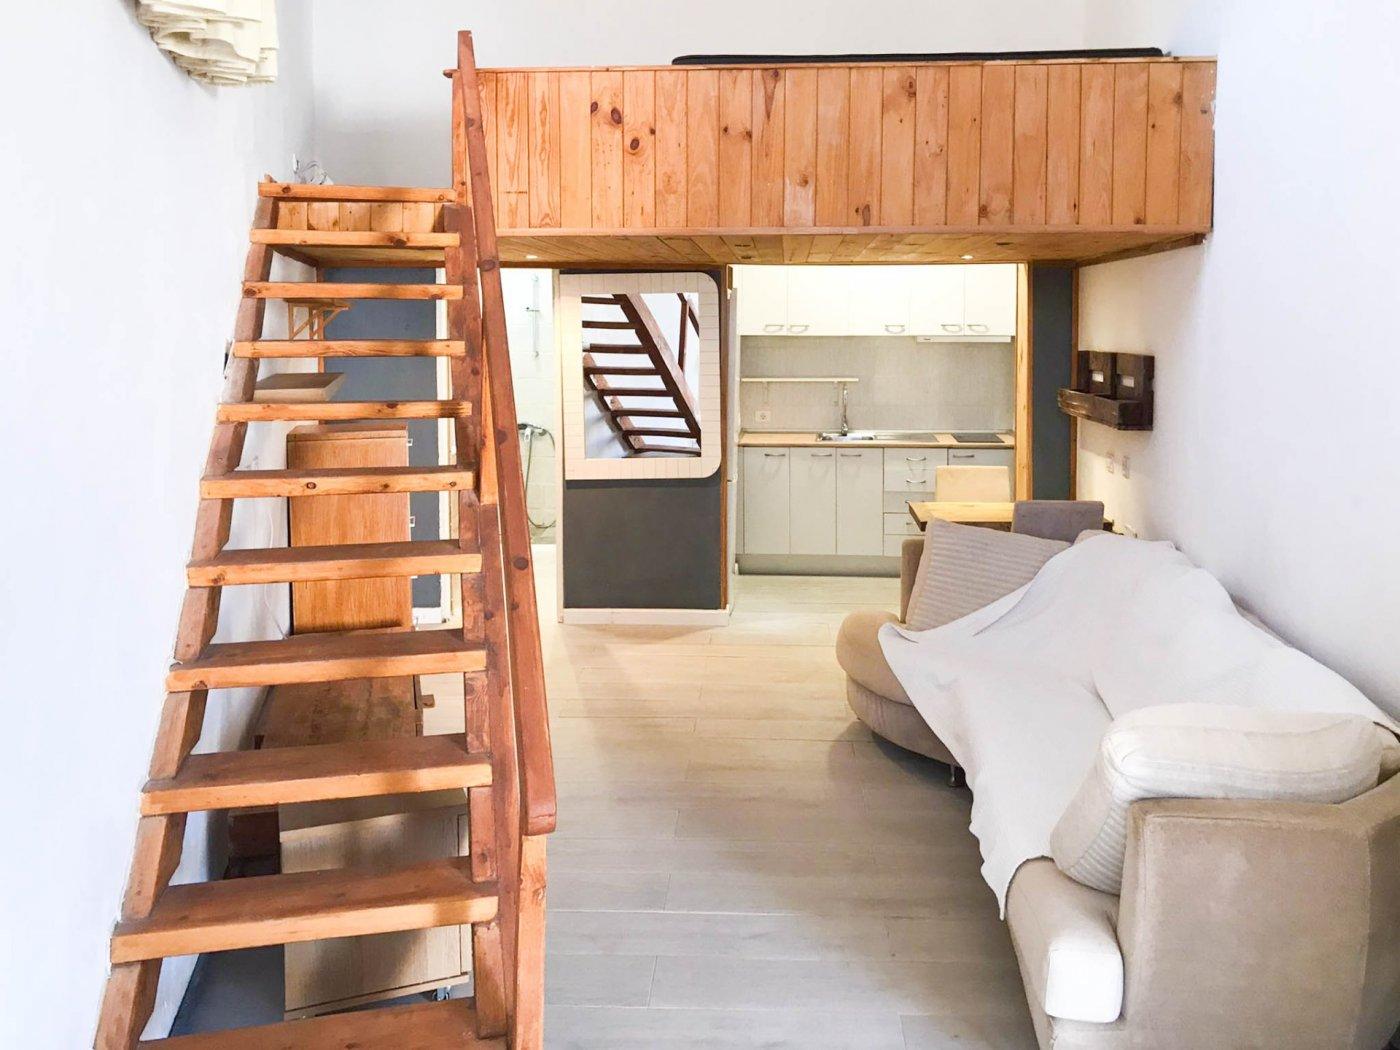 Loft en alquiler en Montaña la Data, San Bartolome de Tirajana